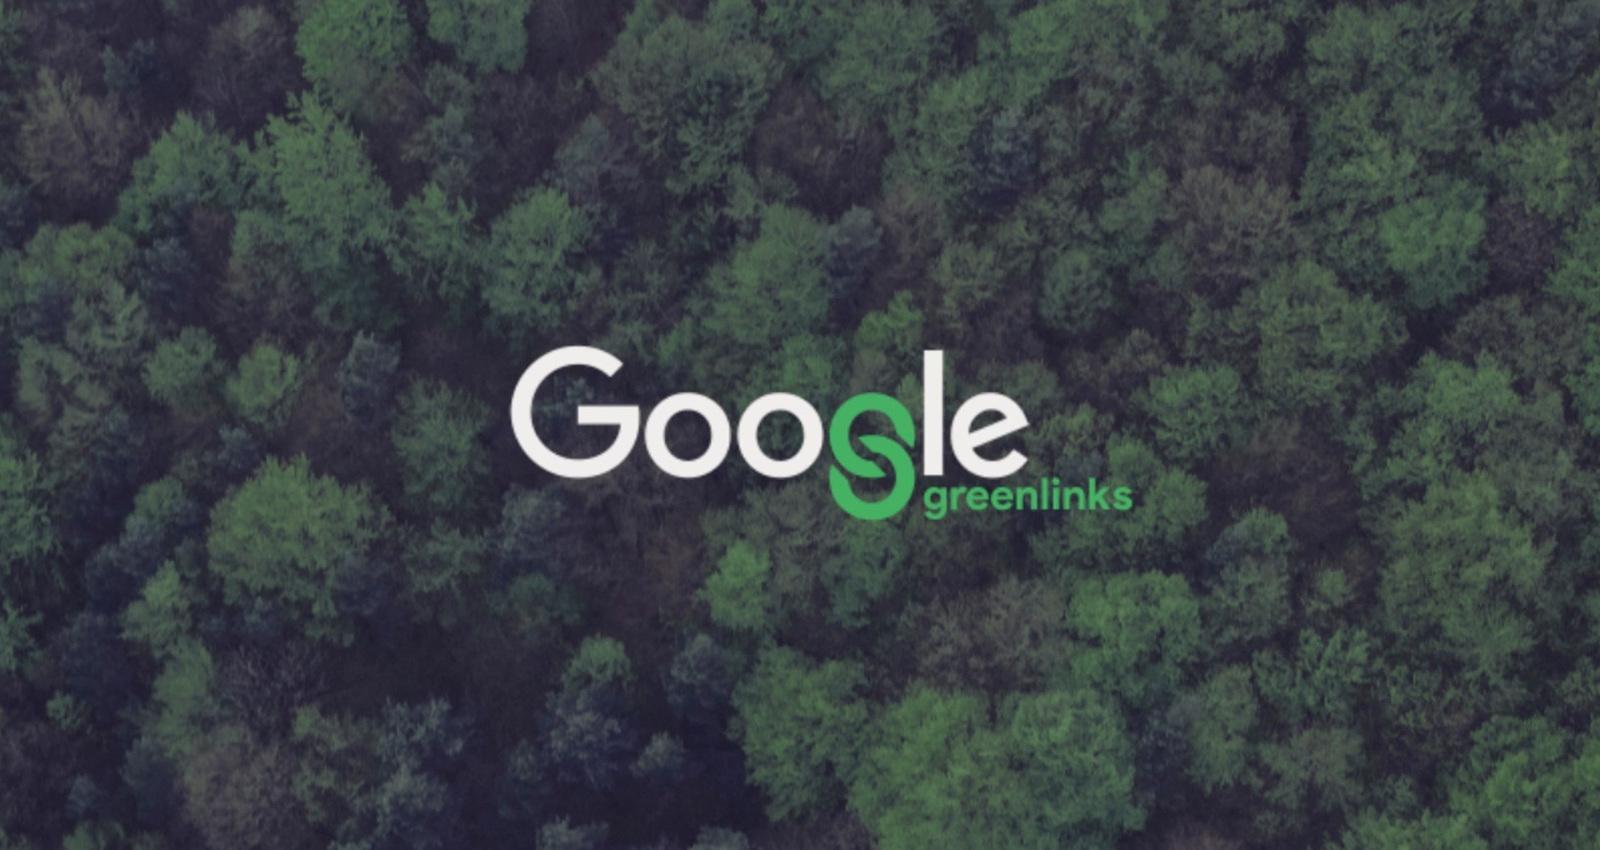 Google Greenlinks